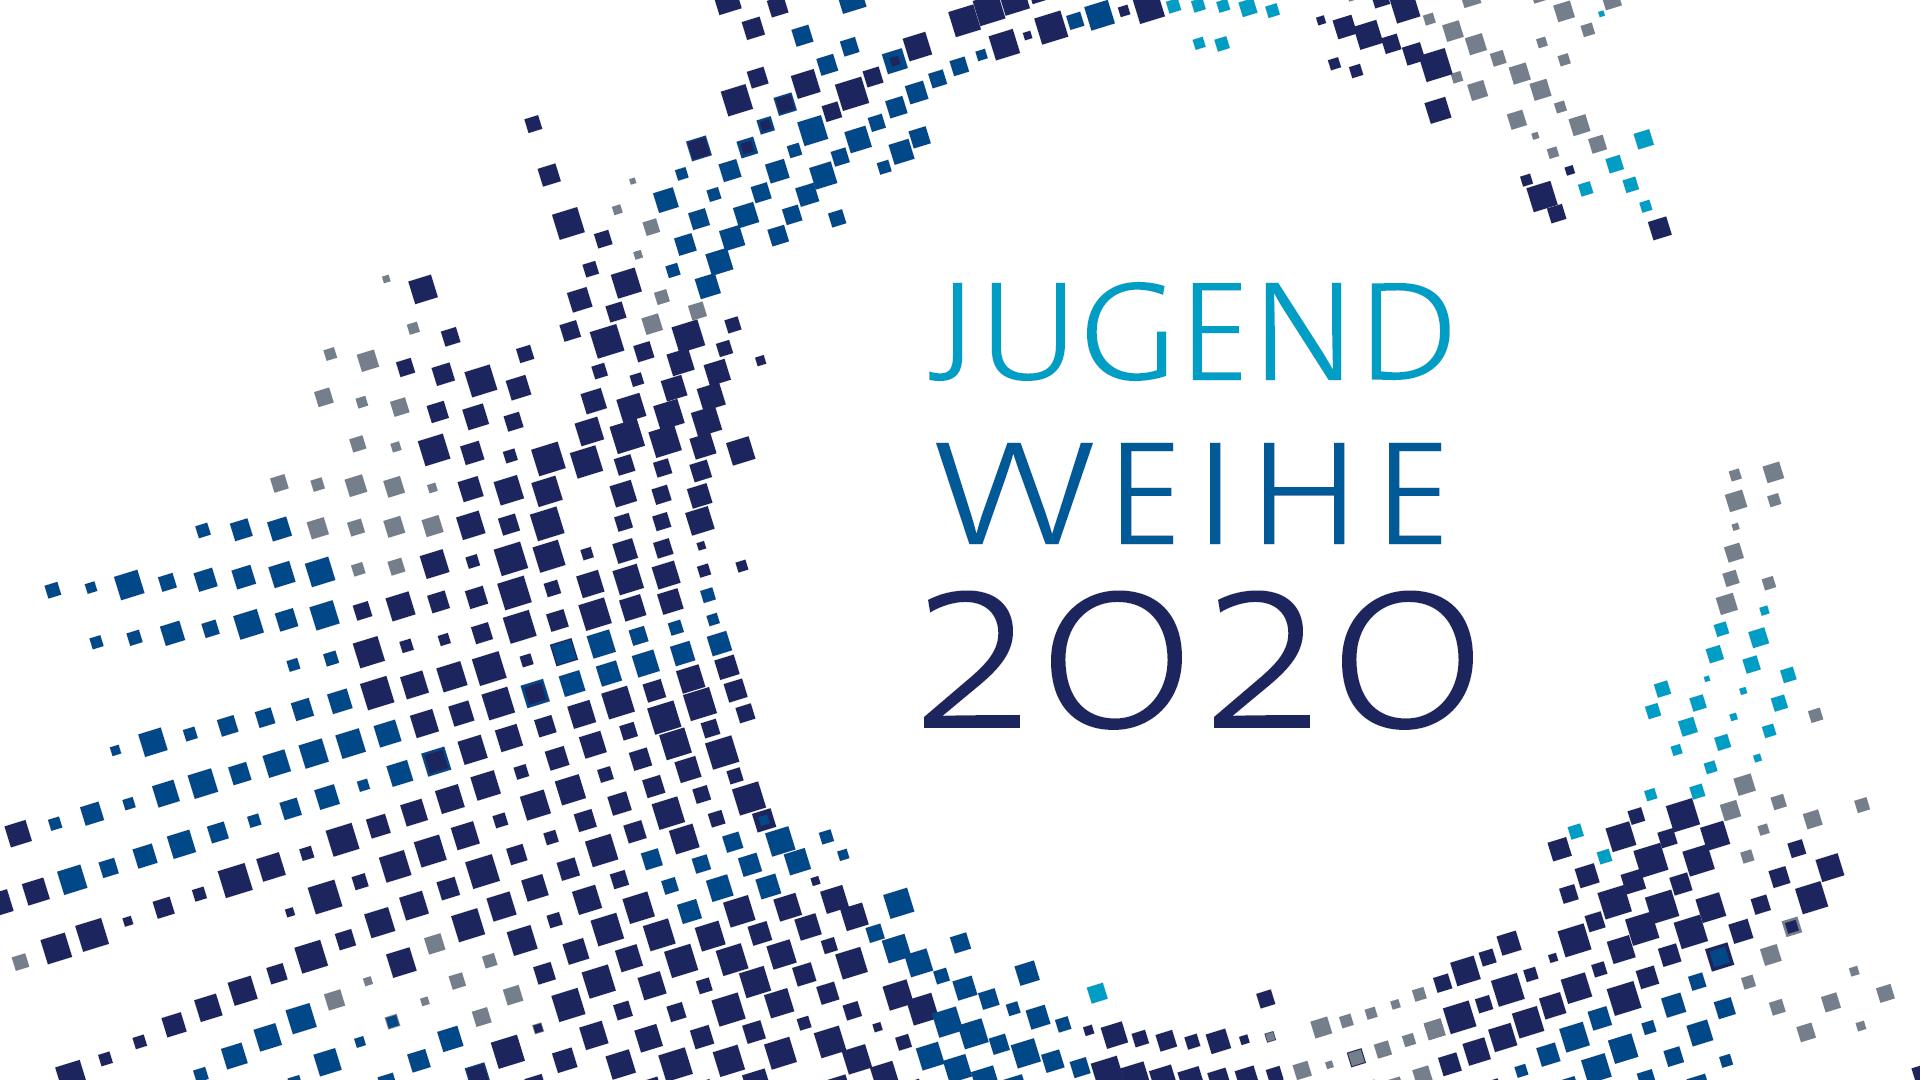 Jugendweihe 2020